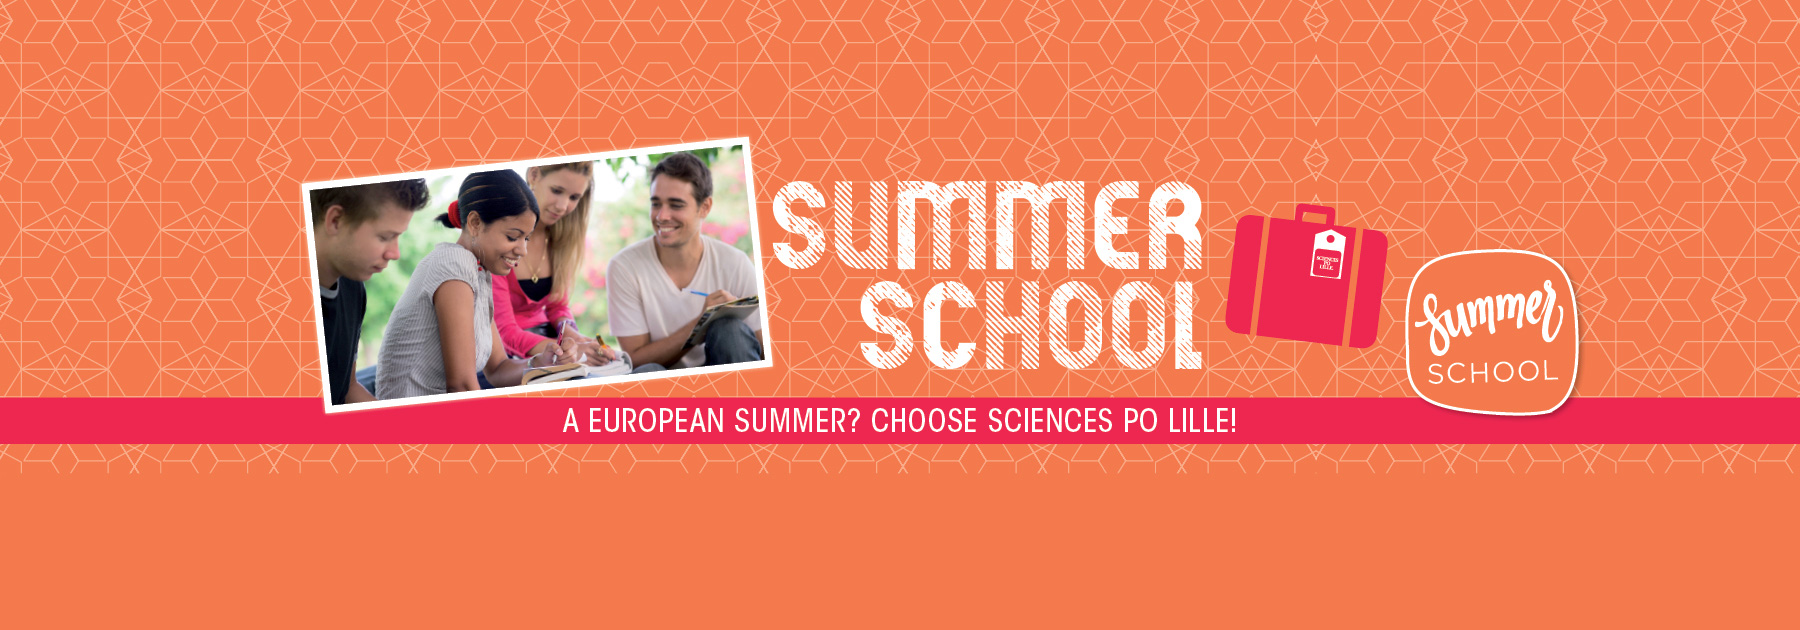 Sciences Po Lille's Summer School